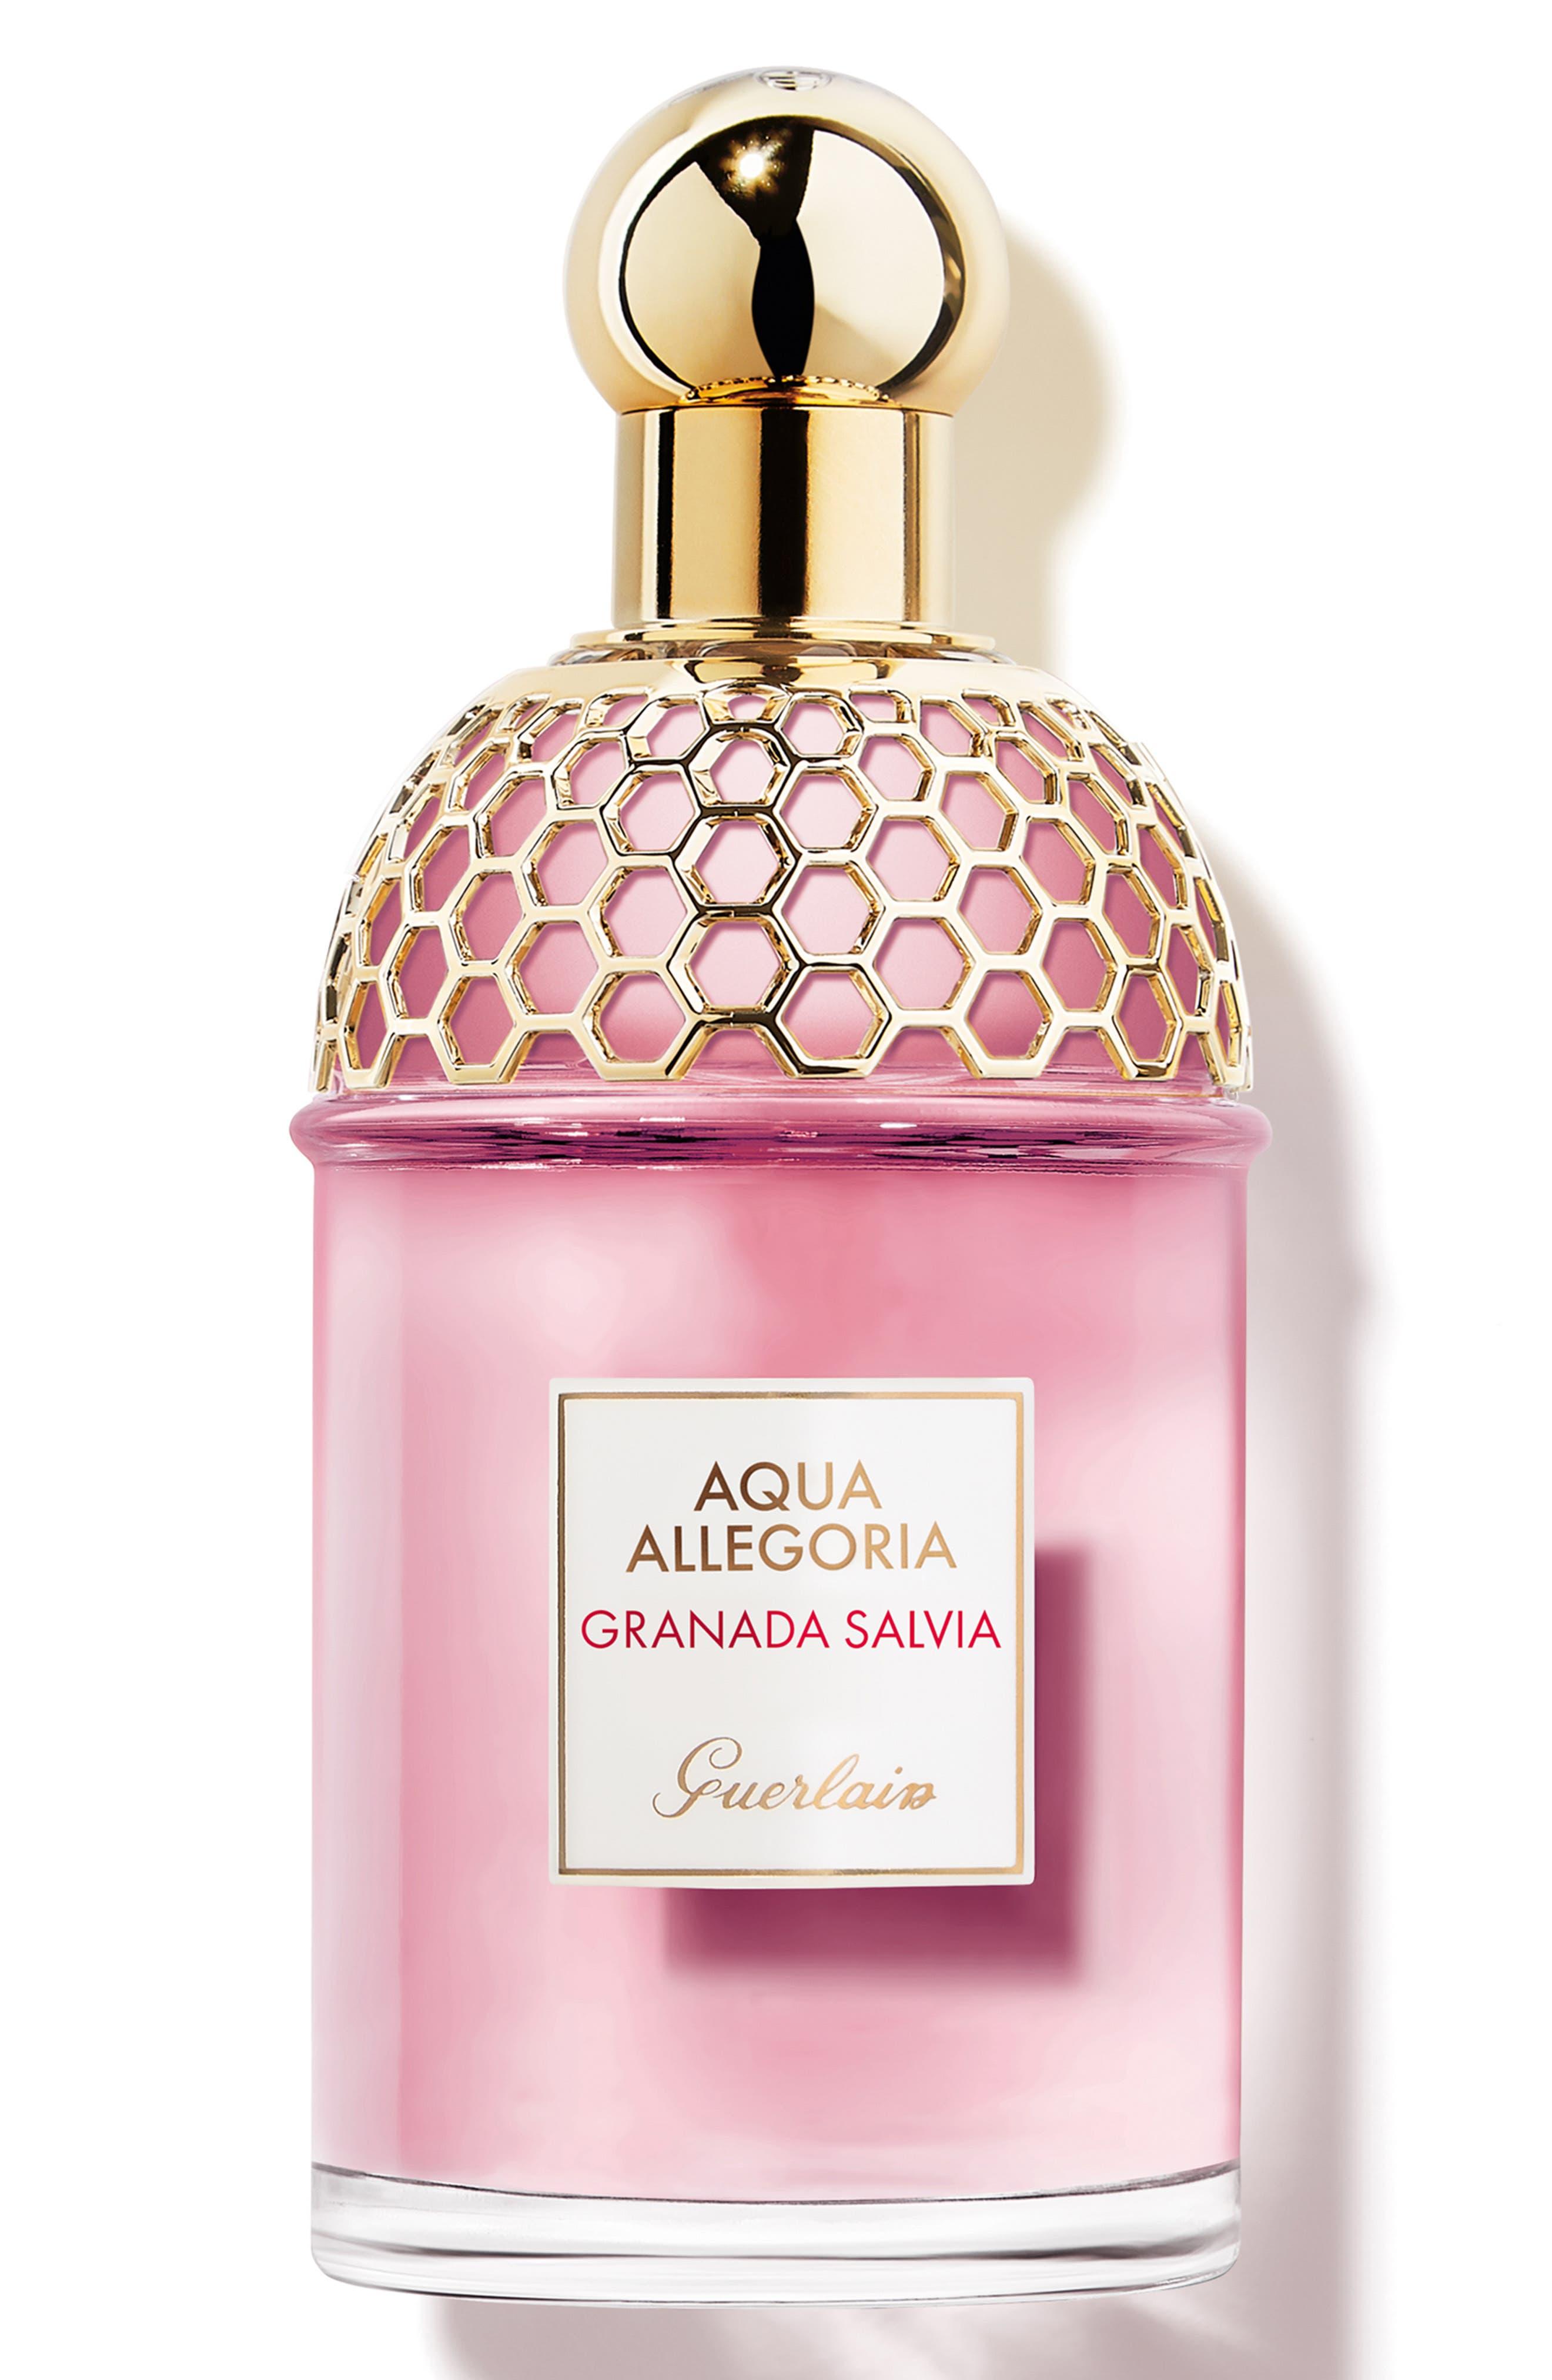 Aqua Allegoria Granada Salvia Eau De Toilette